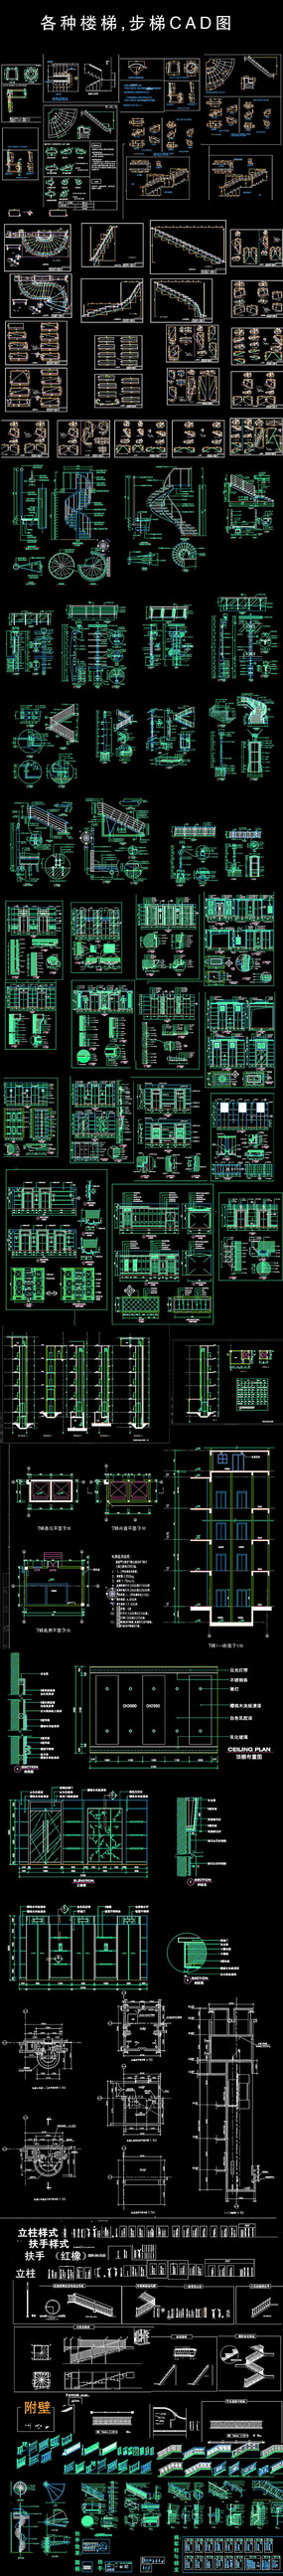 楼梯CAD素材